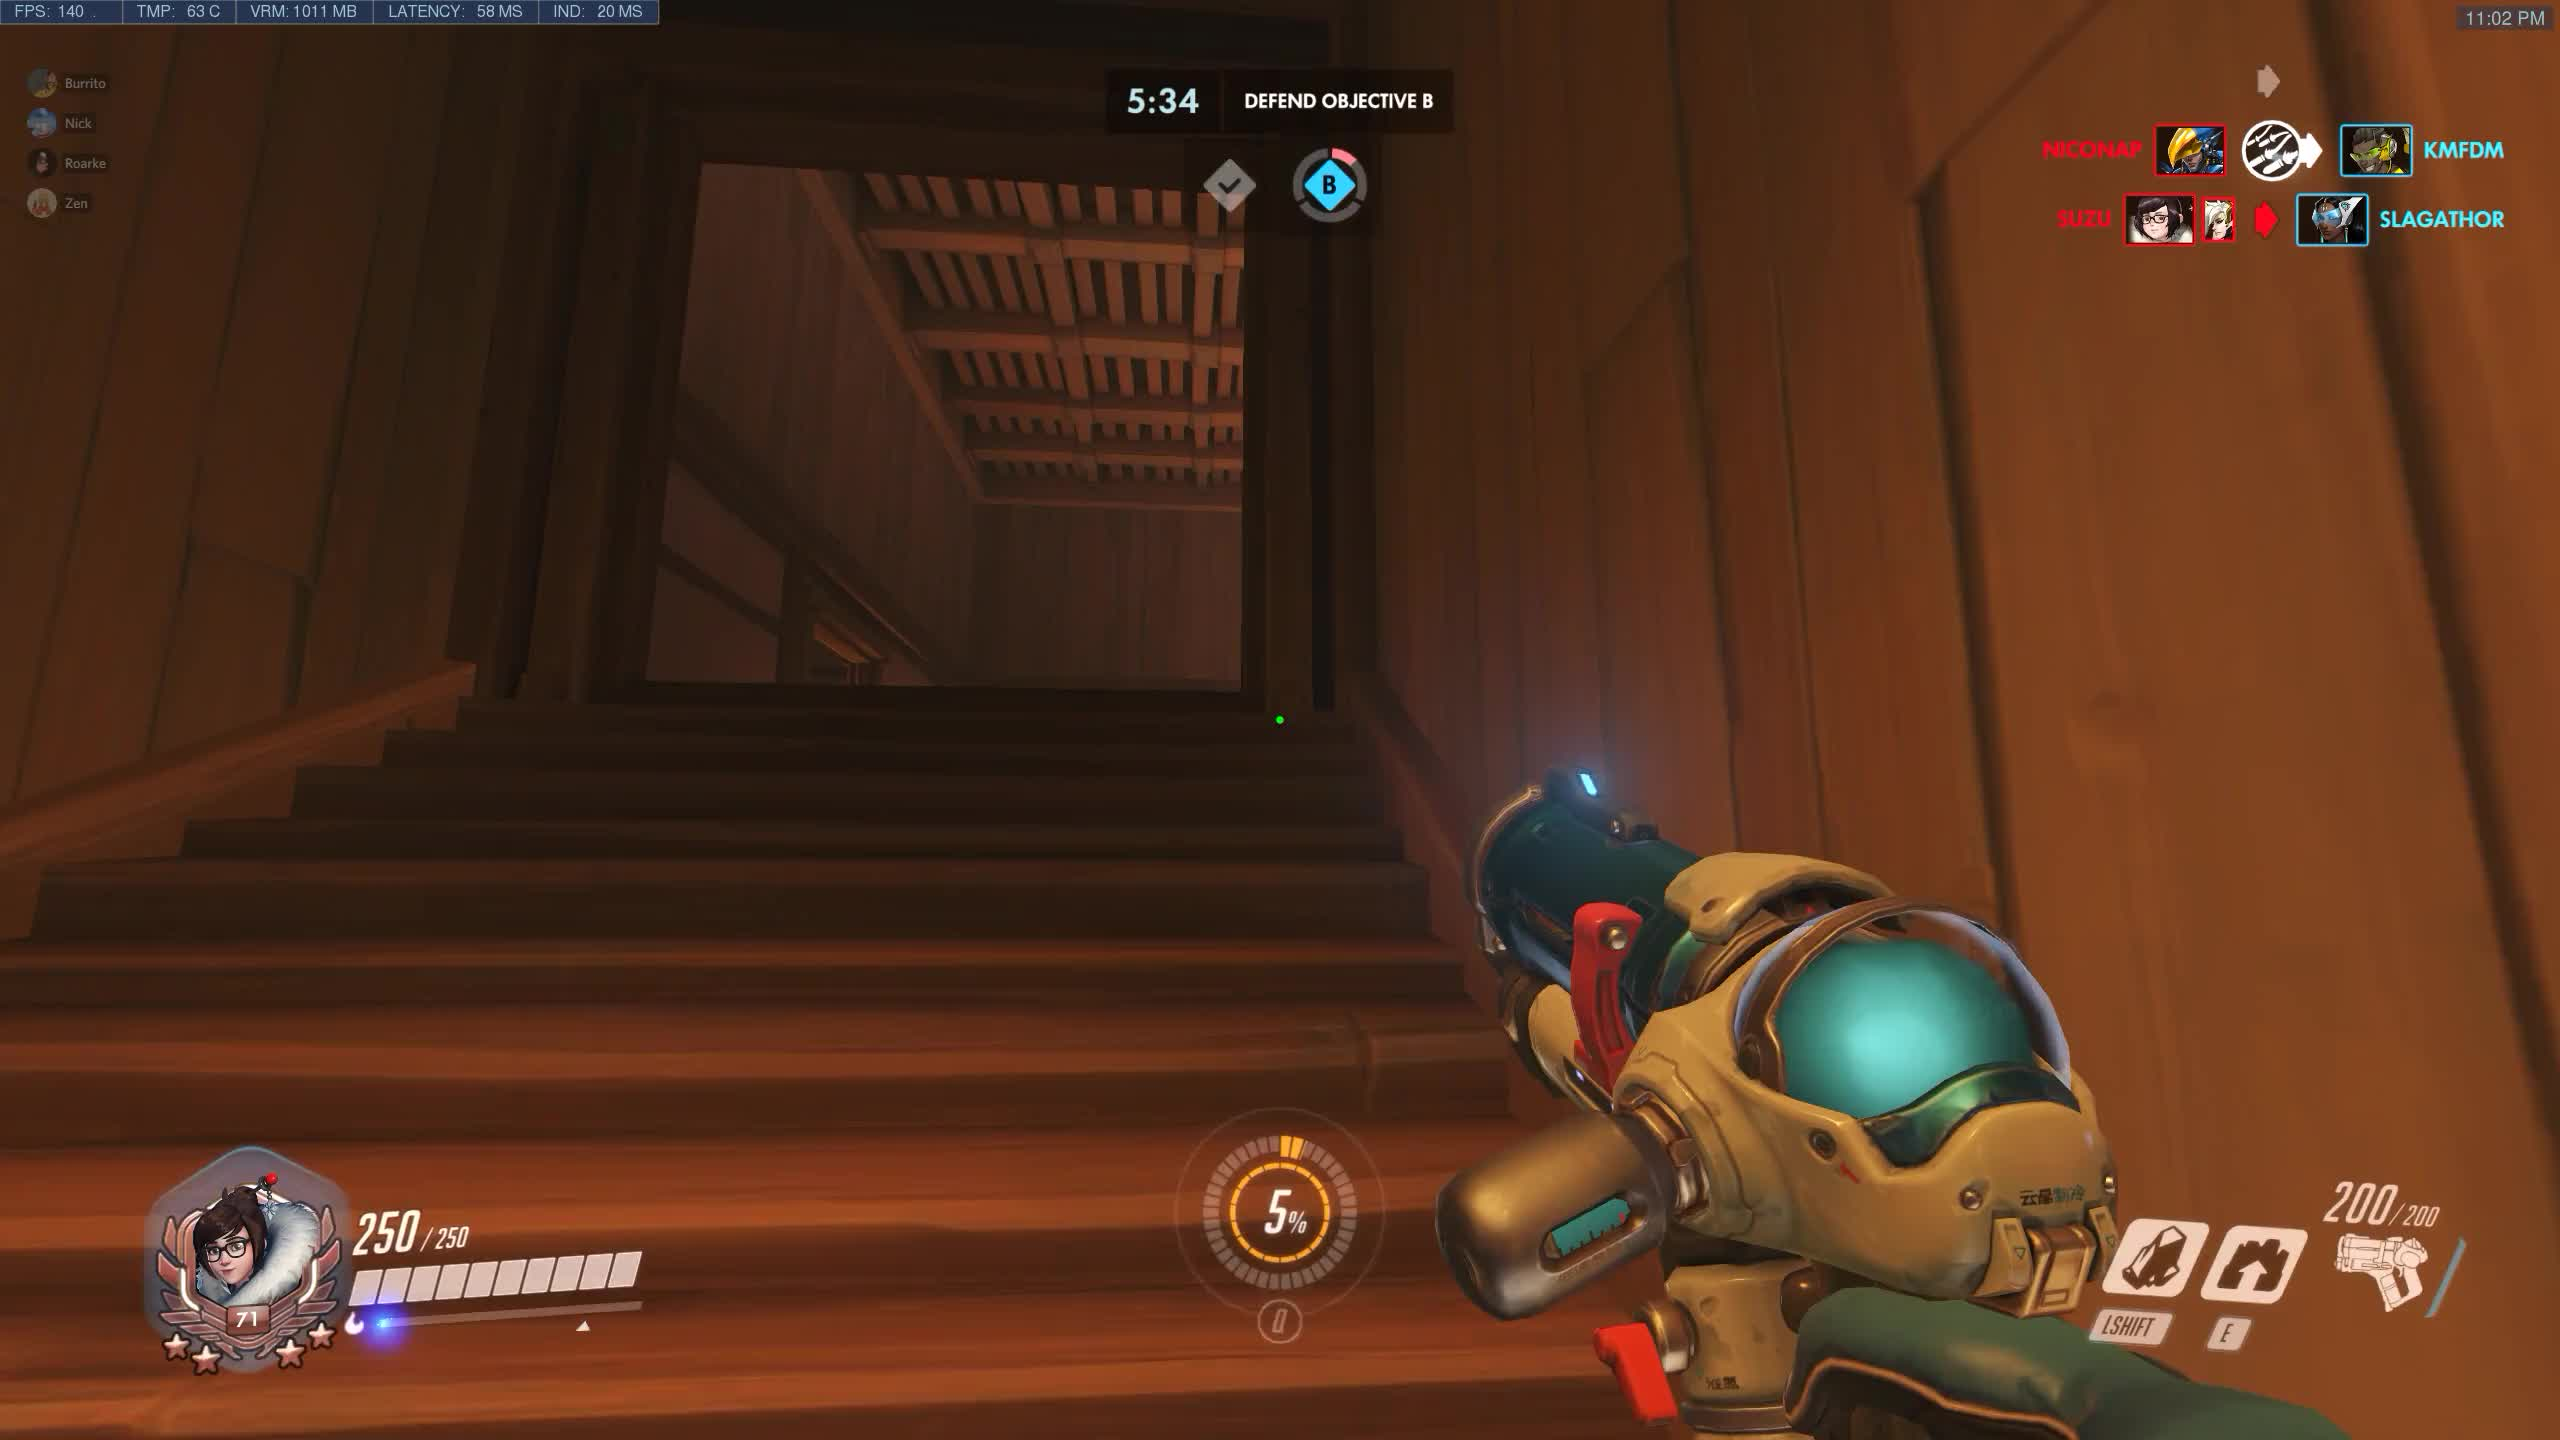 overwatch, Mercy Squash GIFs